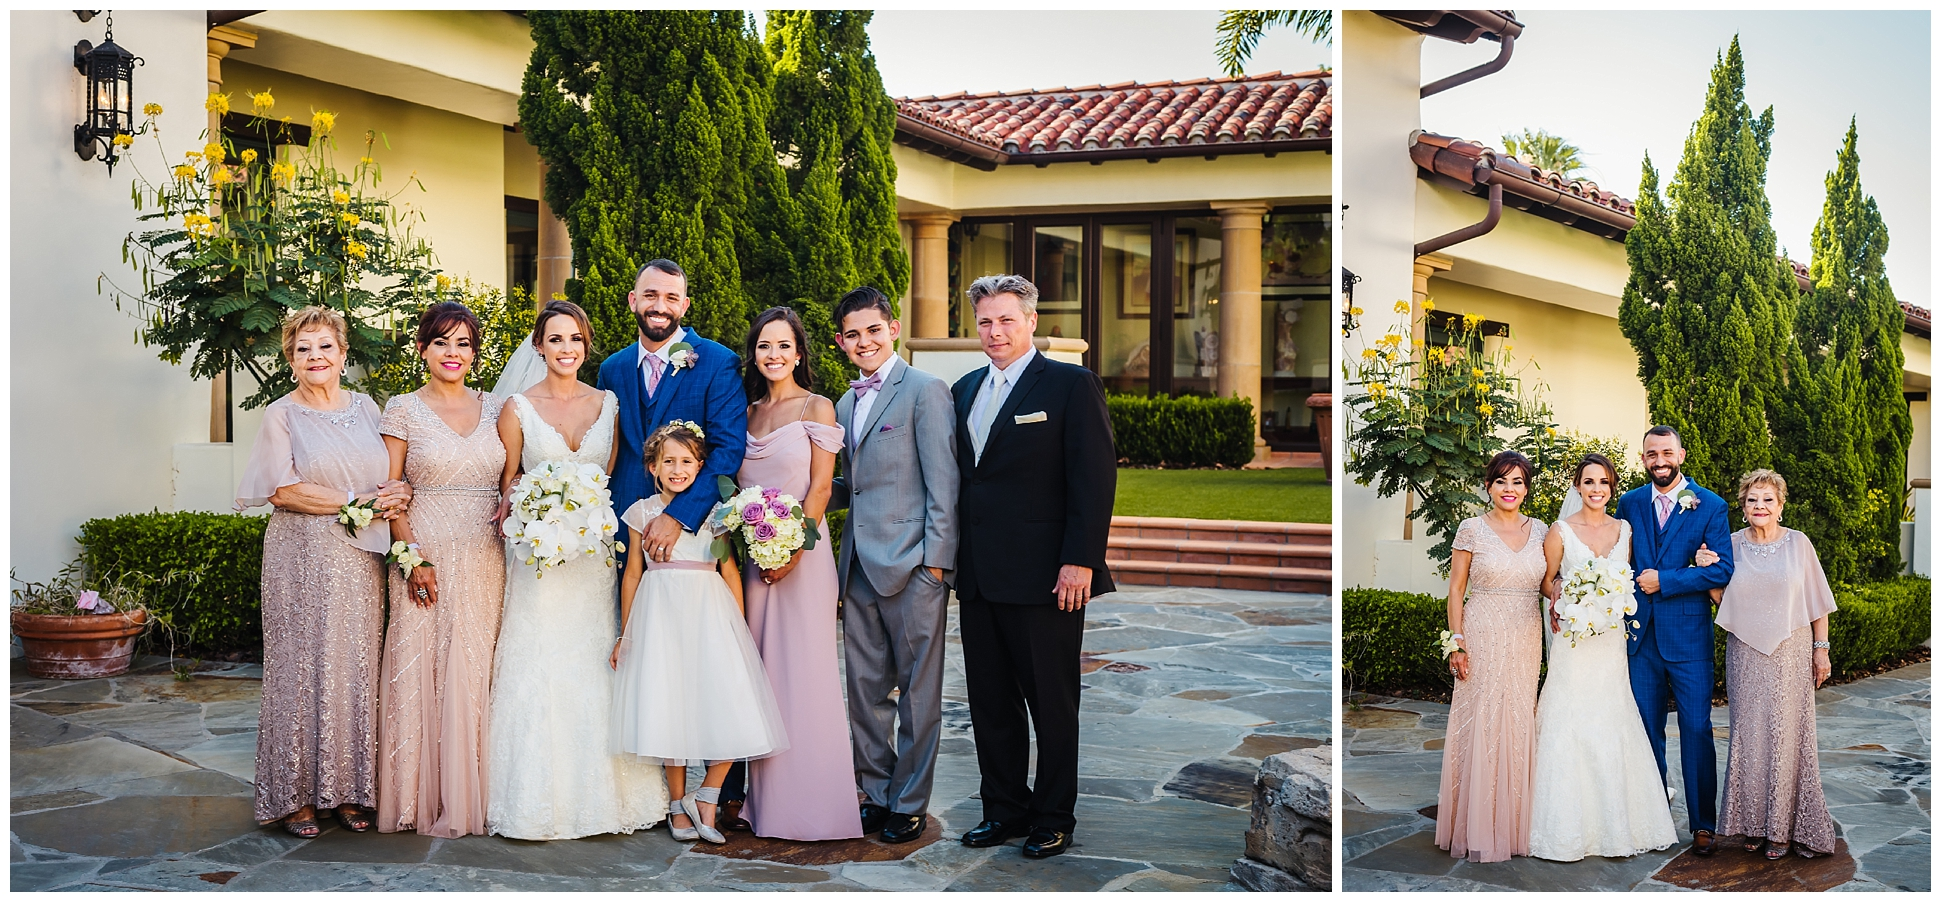 Tampa-luxury-wedding-photographer-mision-lago-private-estate_0033.jpg